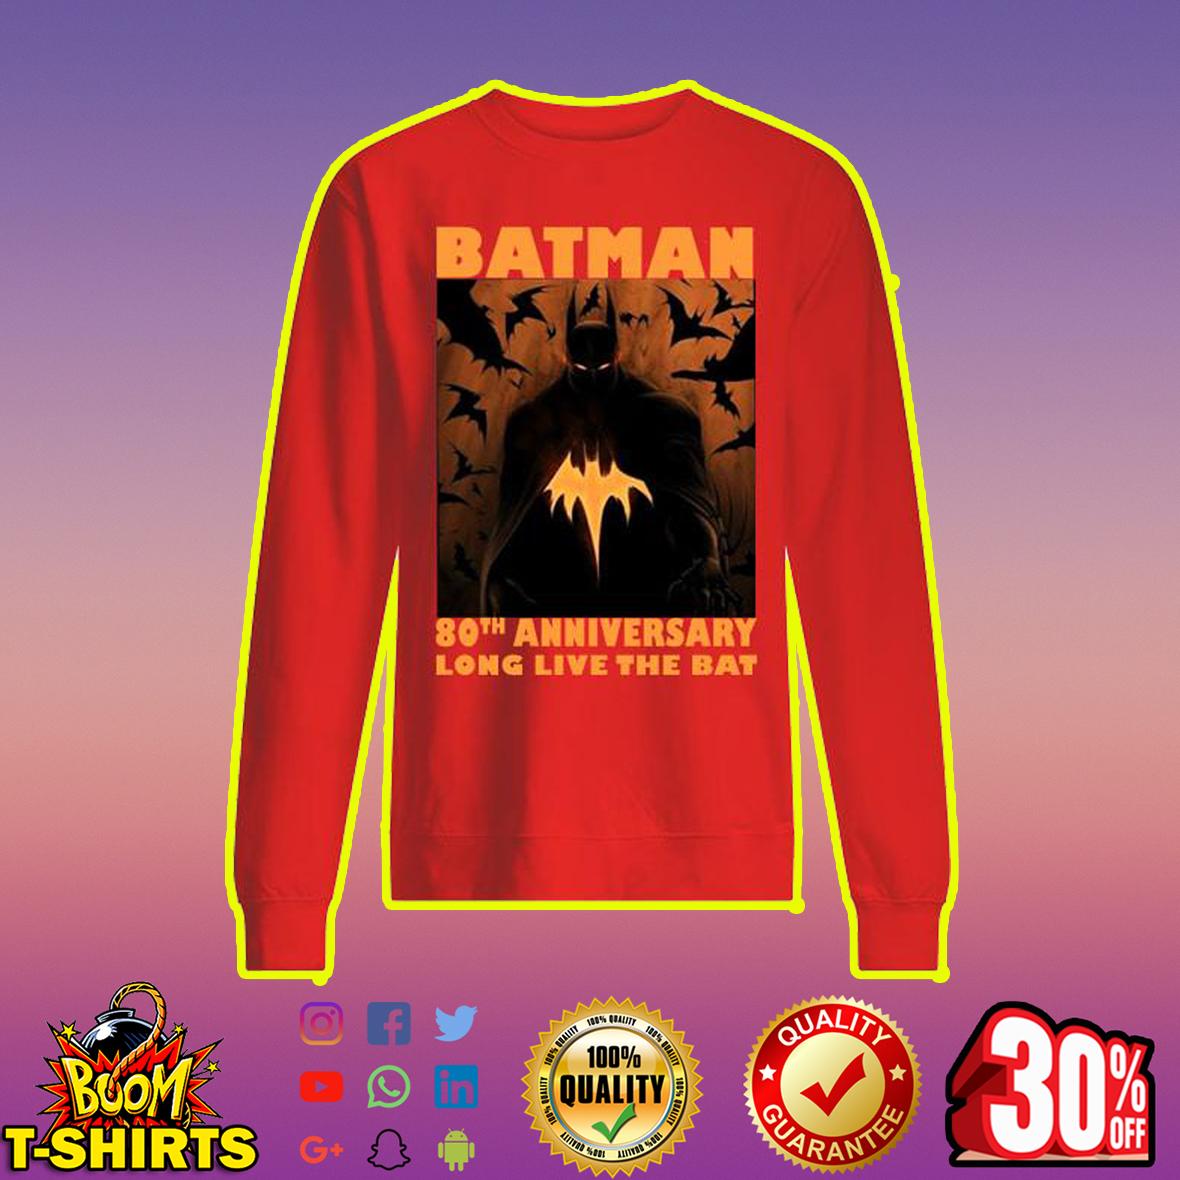 Batman 80th Anniversary Long Live The Bat sweatshirt